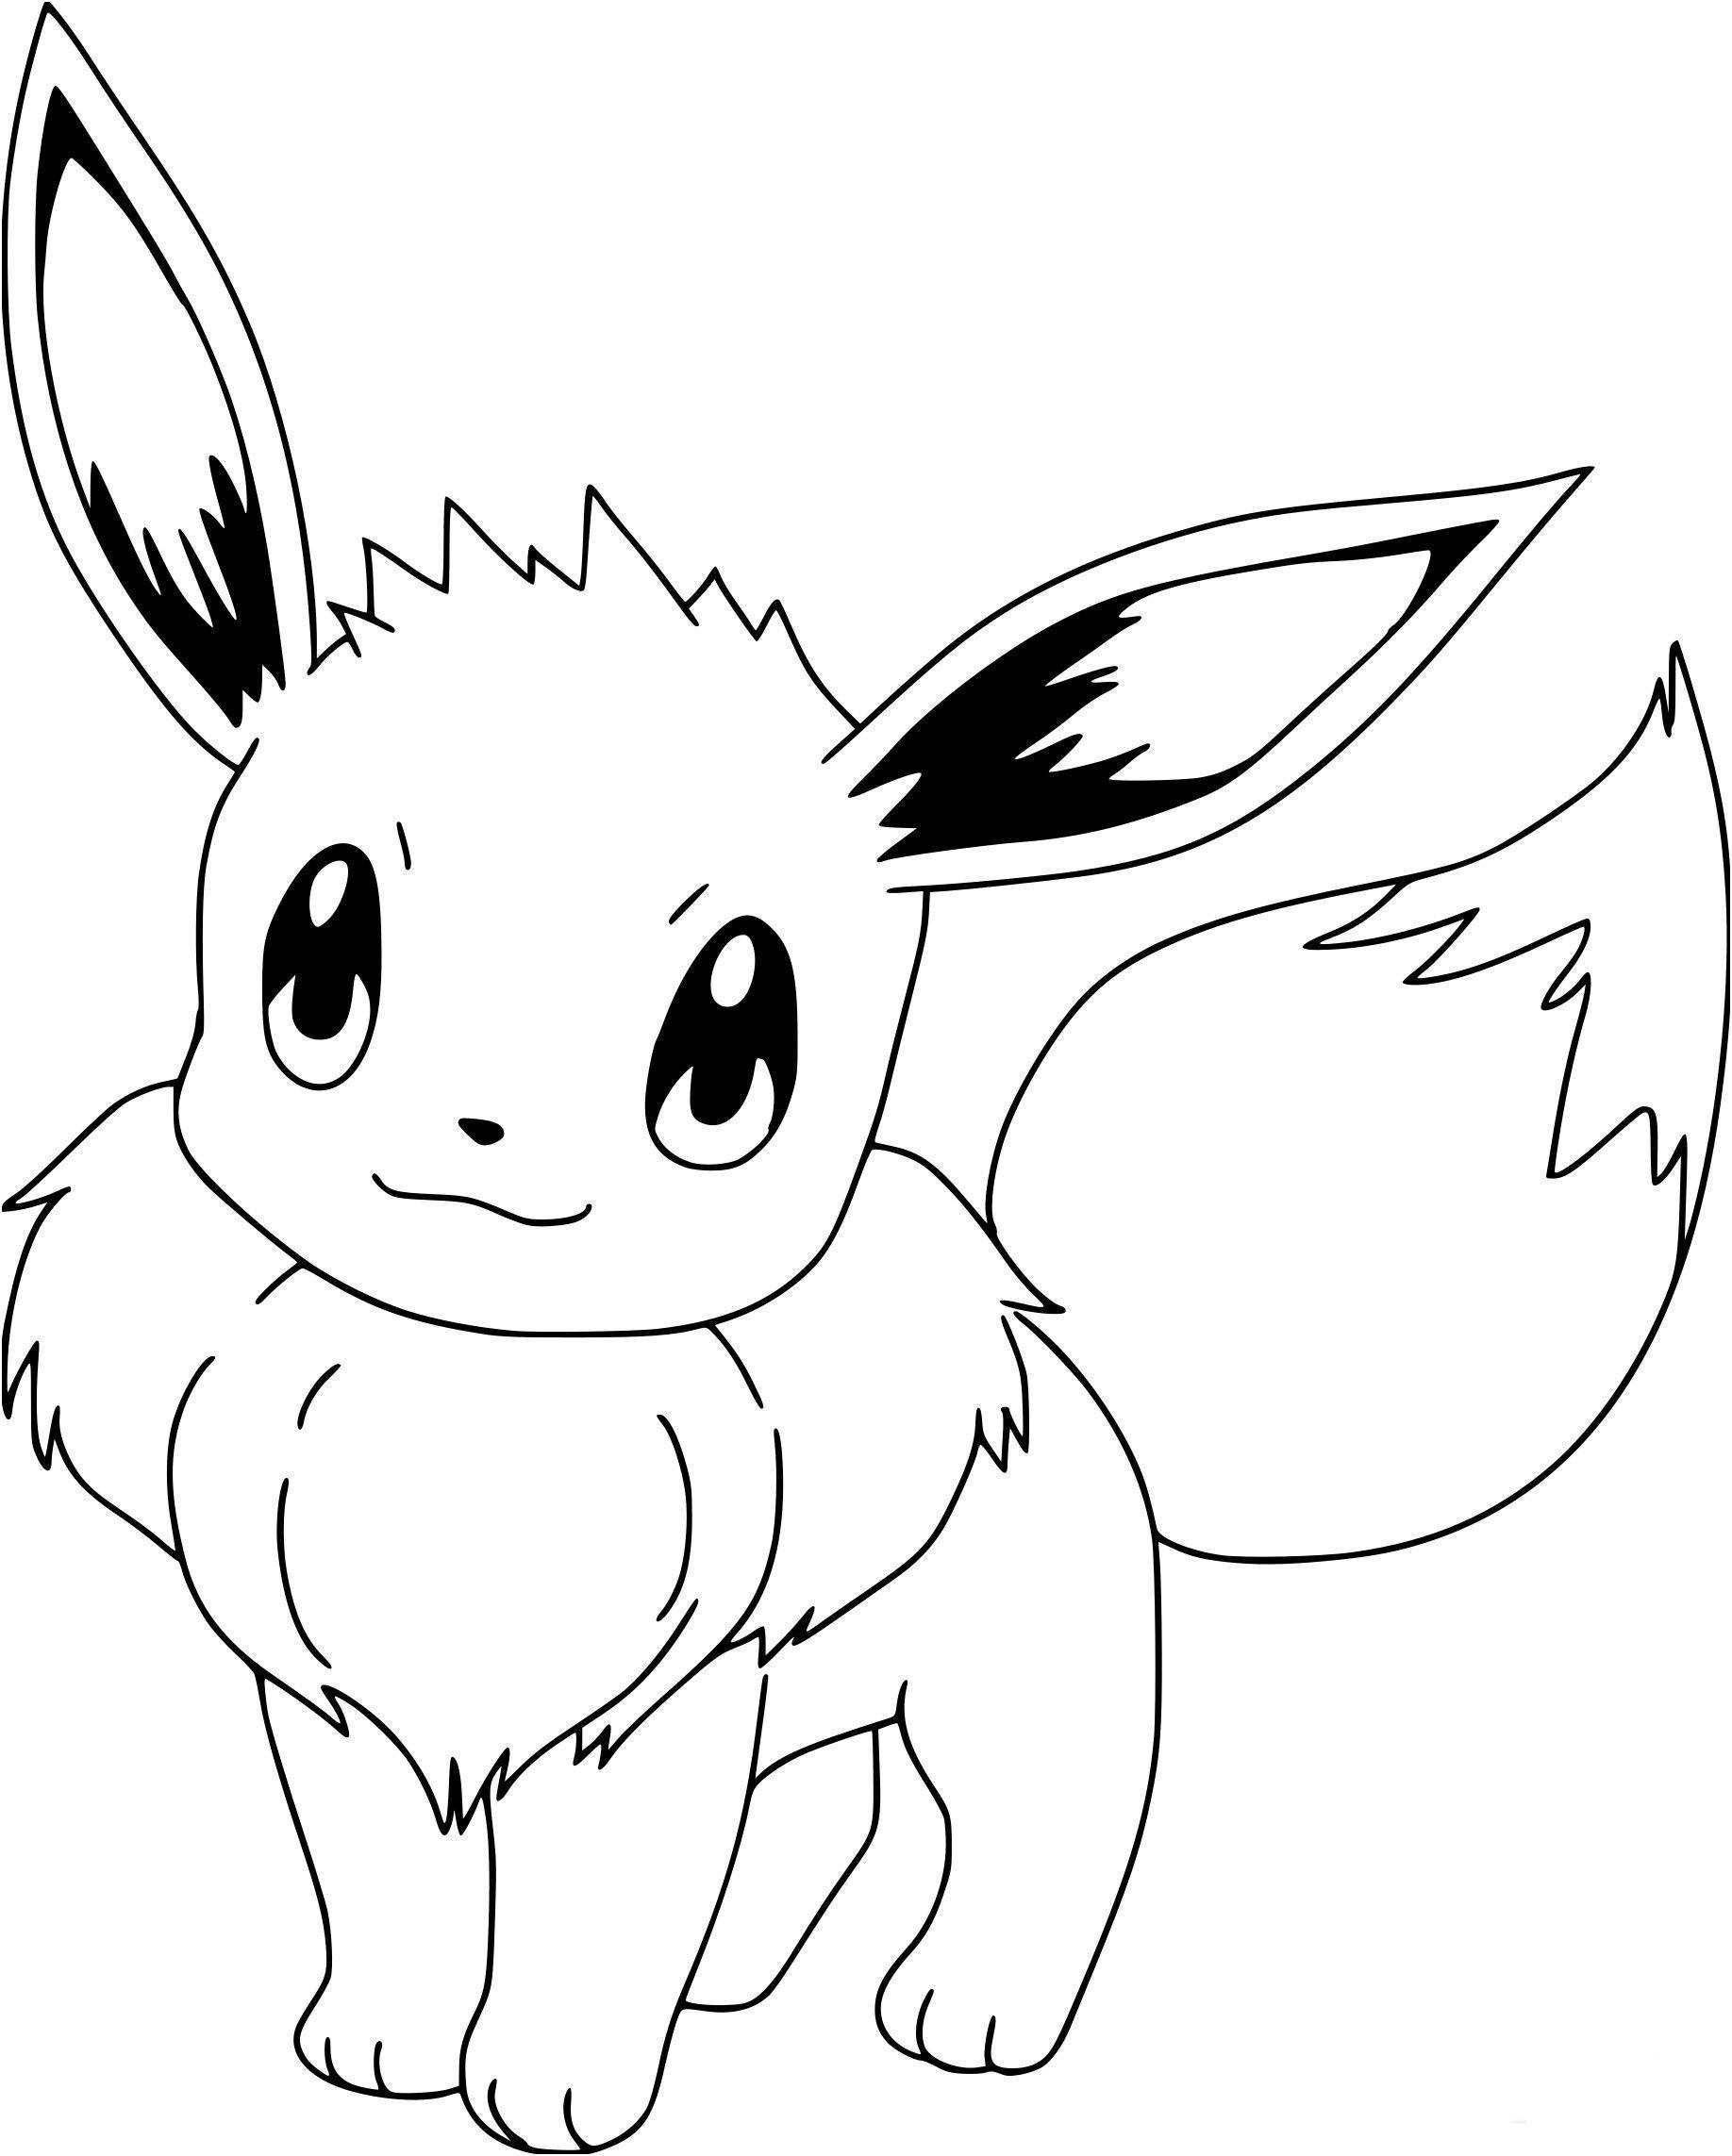 12 Gute Farbung Pokemon Go Stock Pokemon Coloring Pages Pokemon